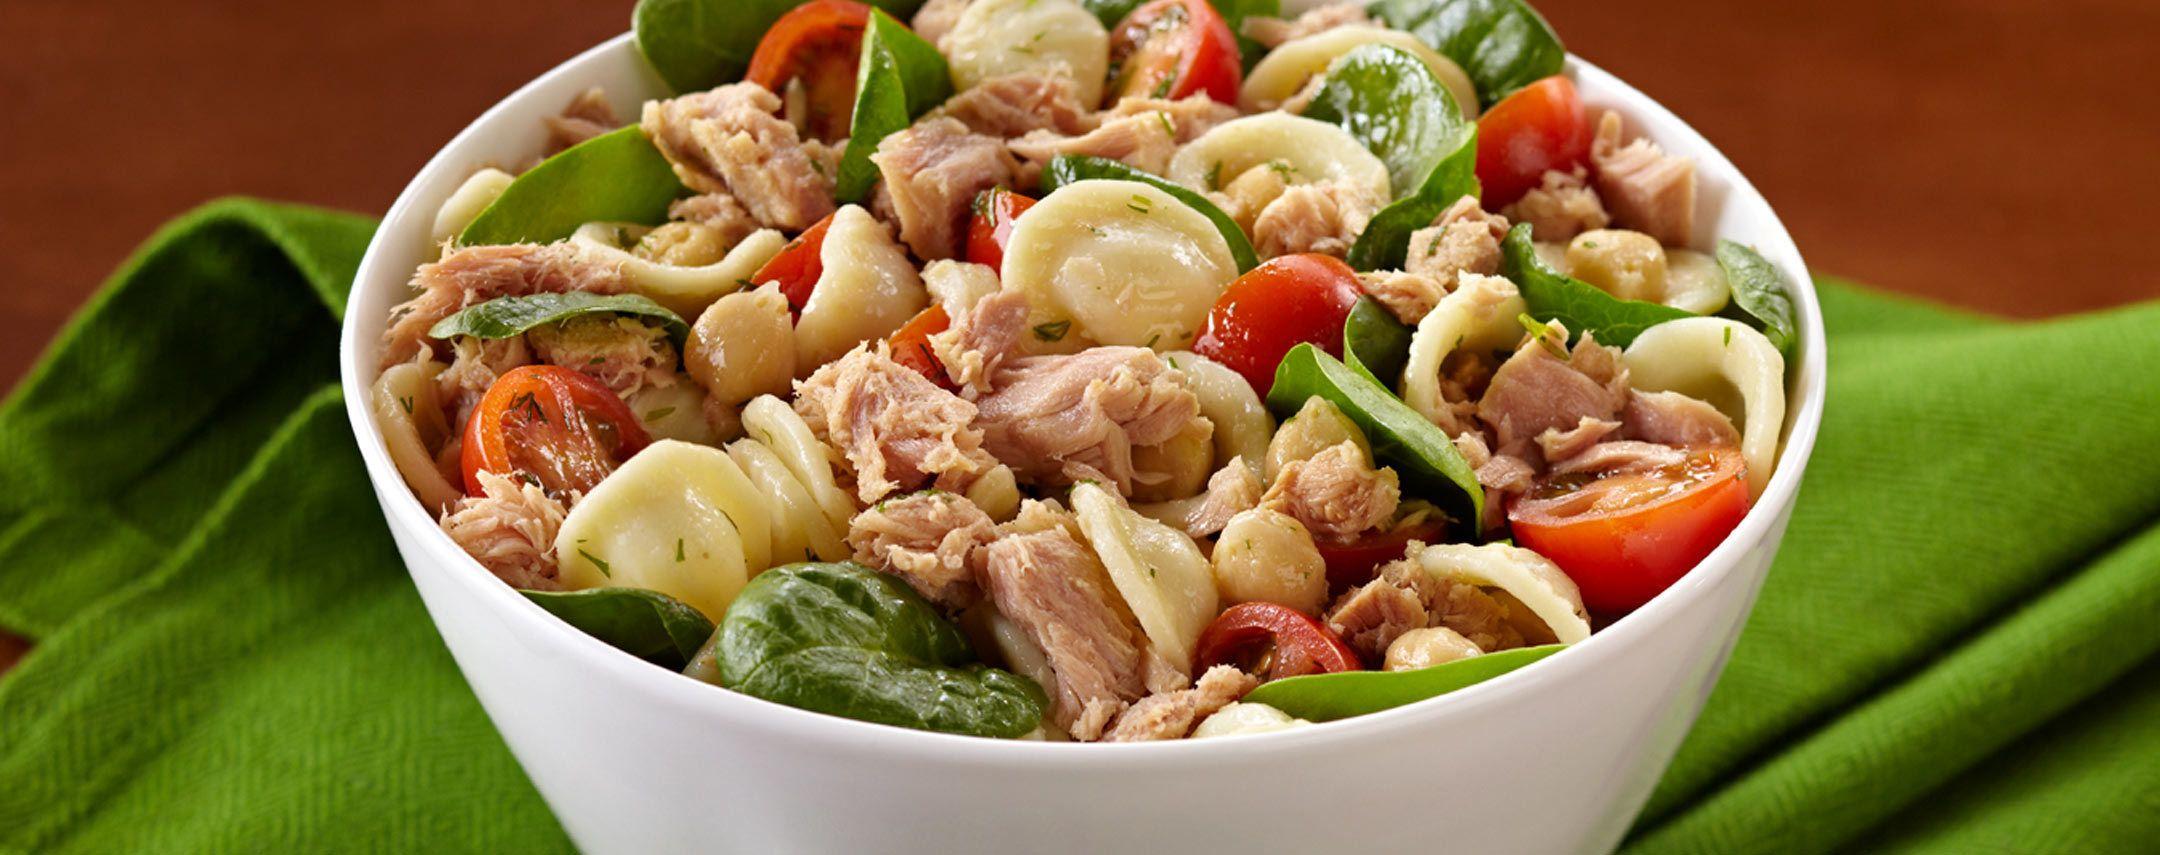 Tuna Pasta Salad | Recipe | Spinach, Tuna pasta salads and Tuna pasta